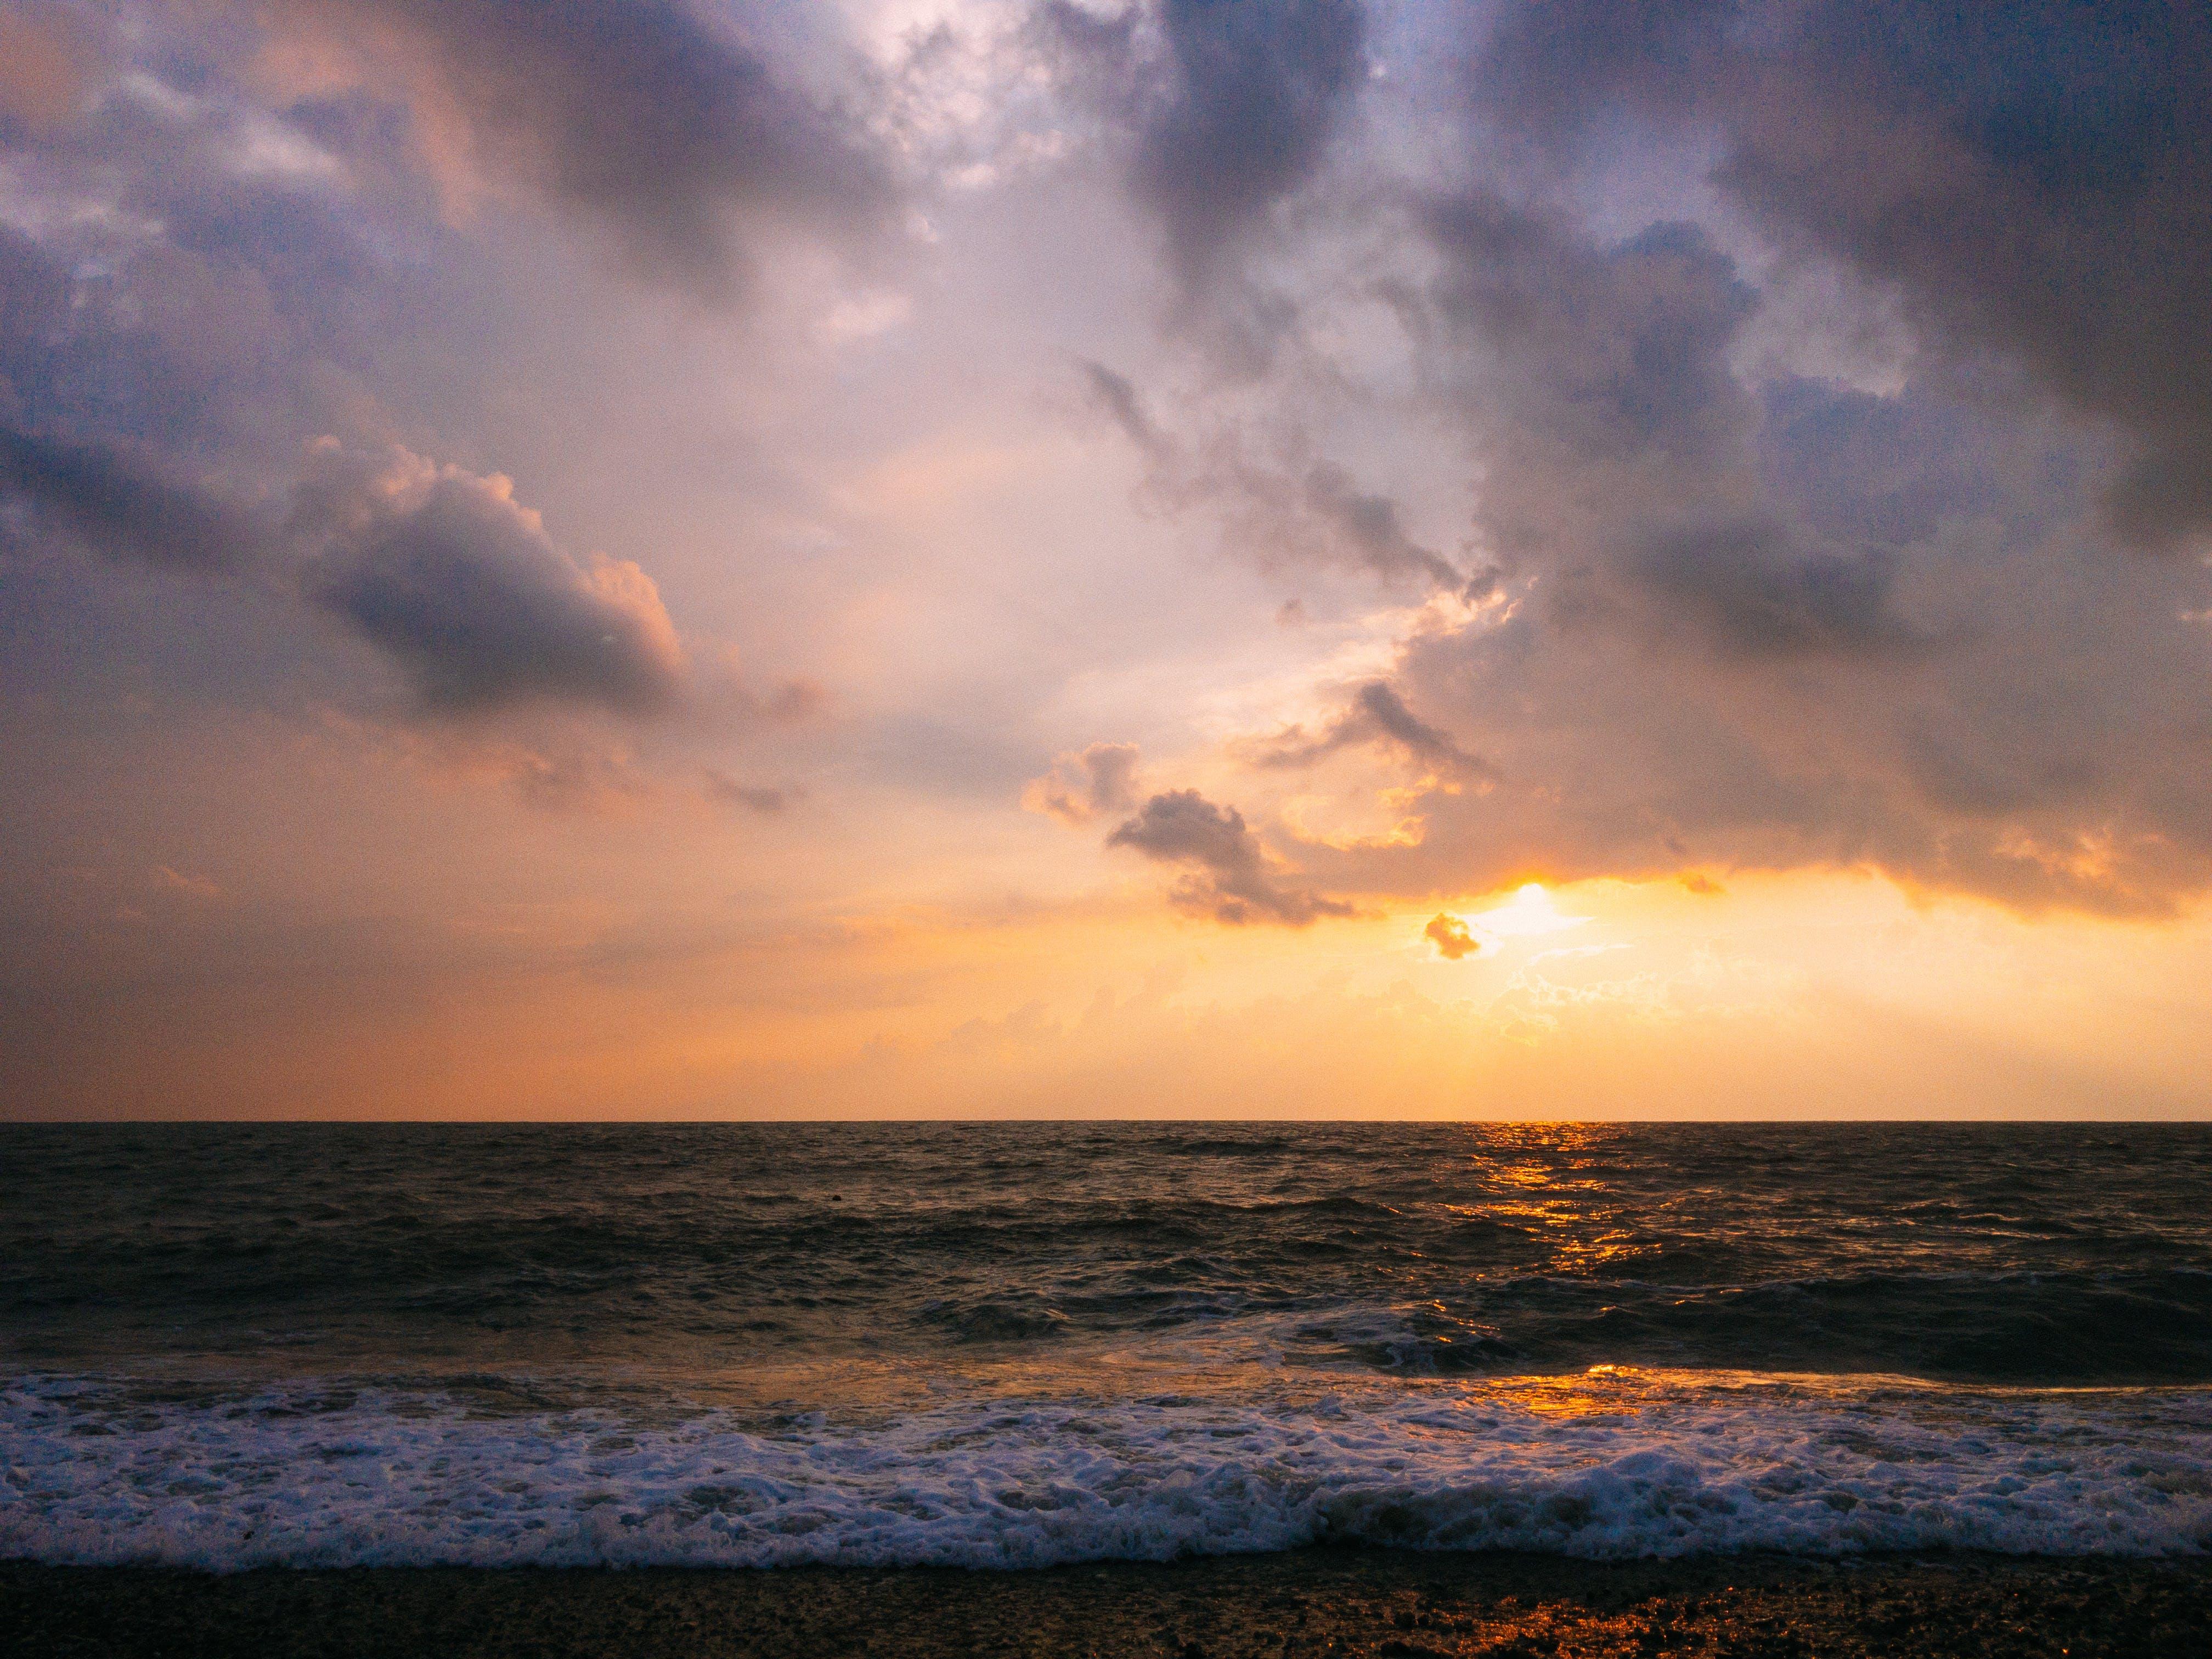 Kostenloses Stock Foto zu abend, goldene stunde, himmel, horizont